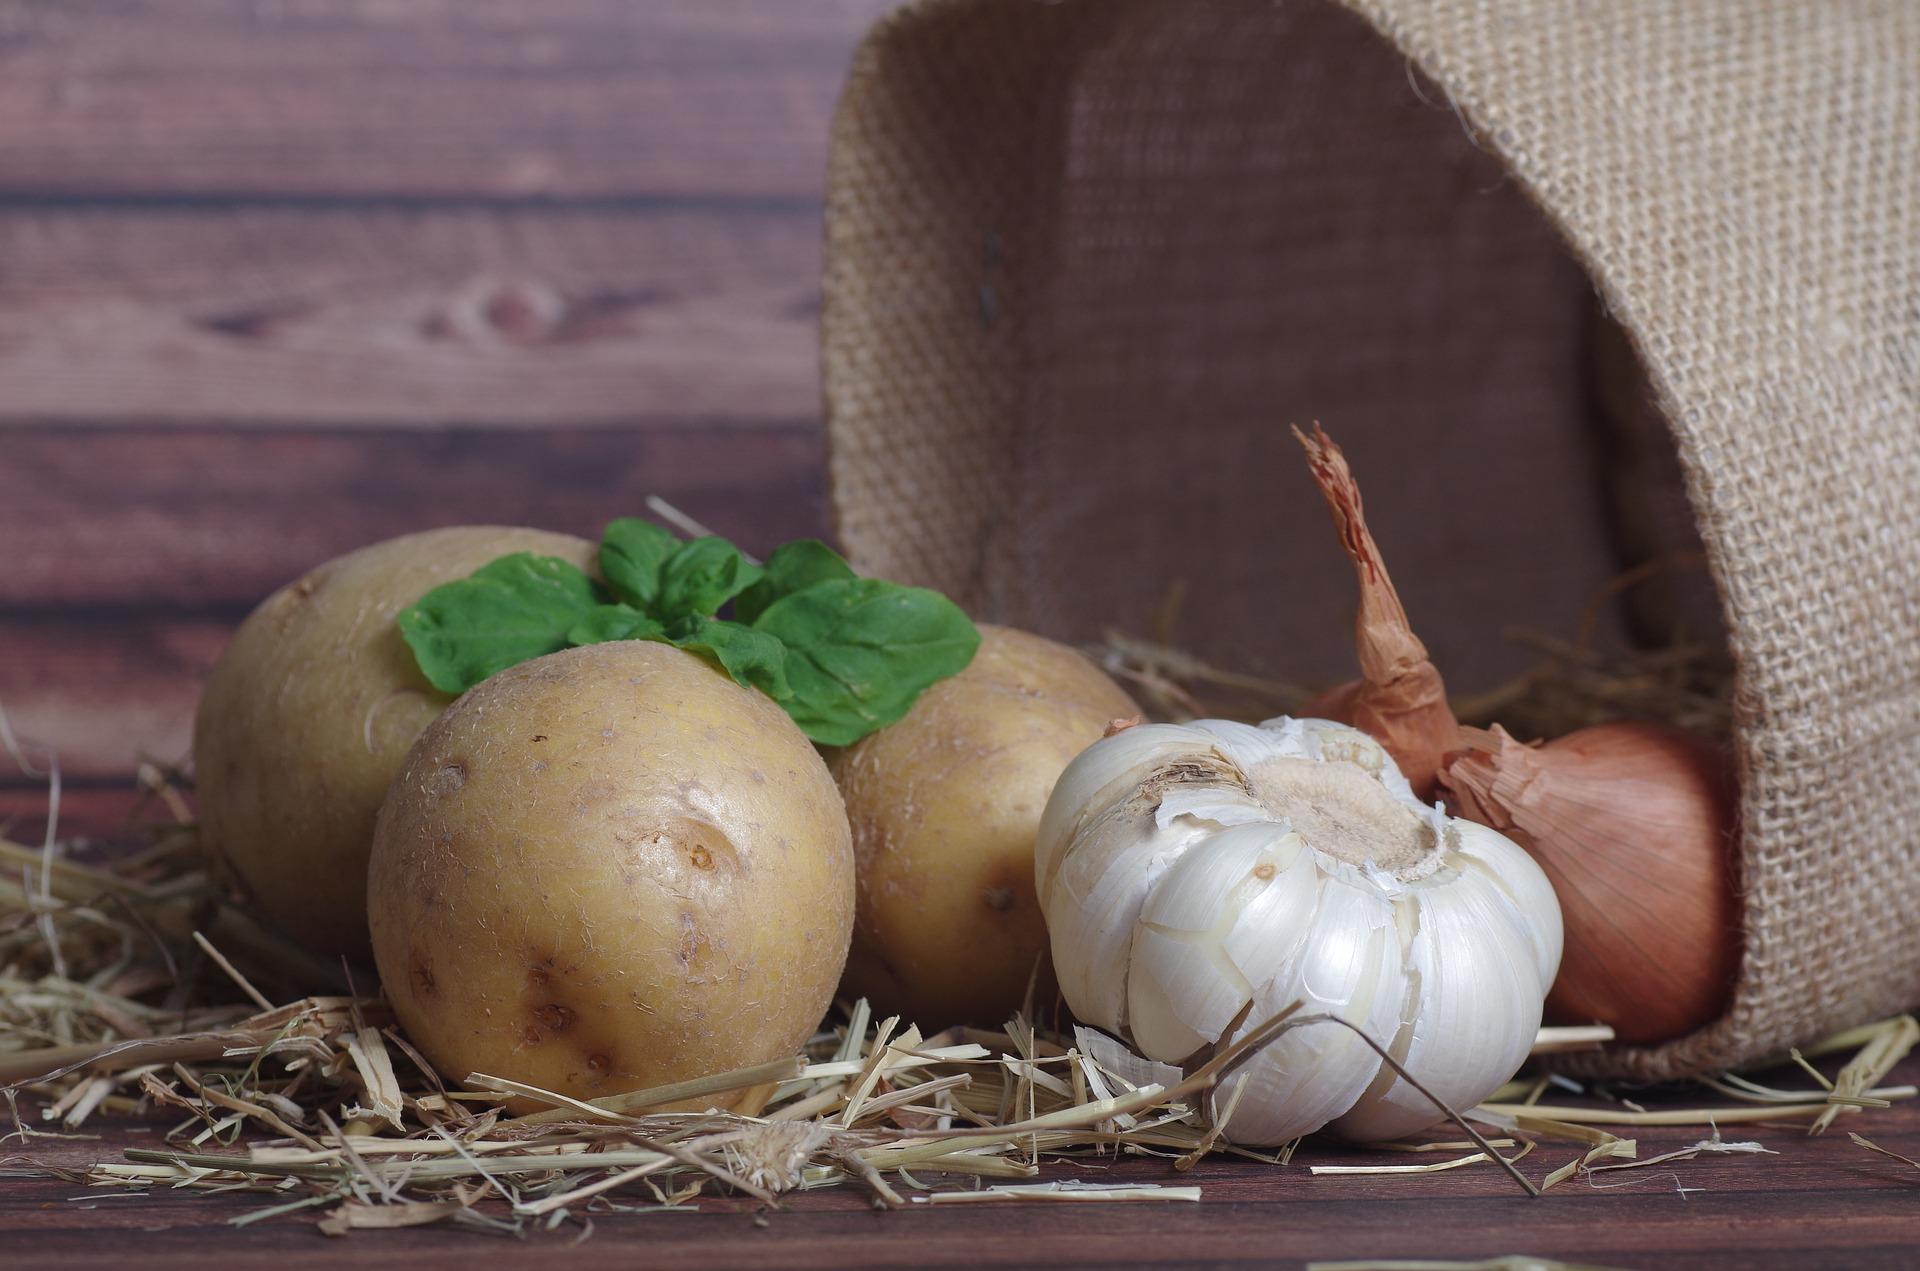 potatoes-2046524_1920.jpg